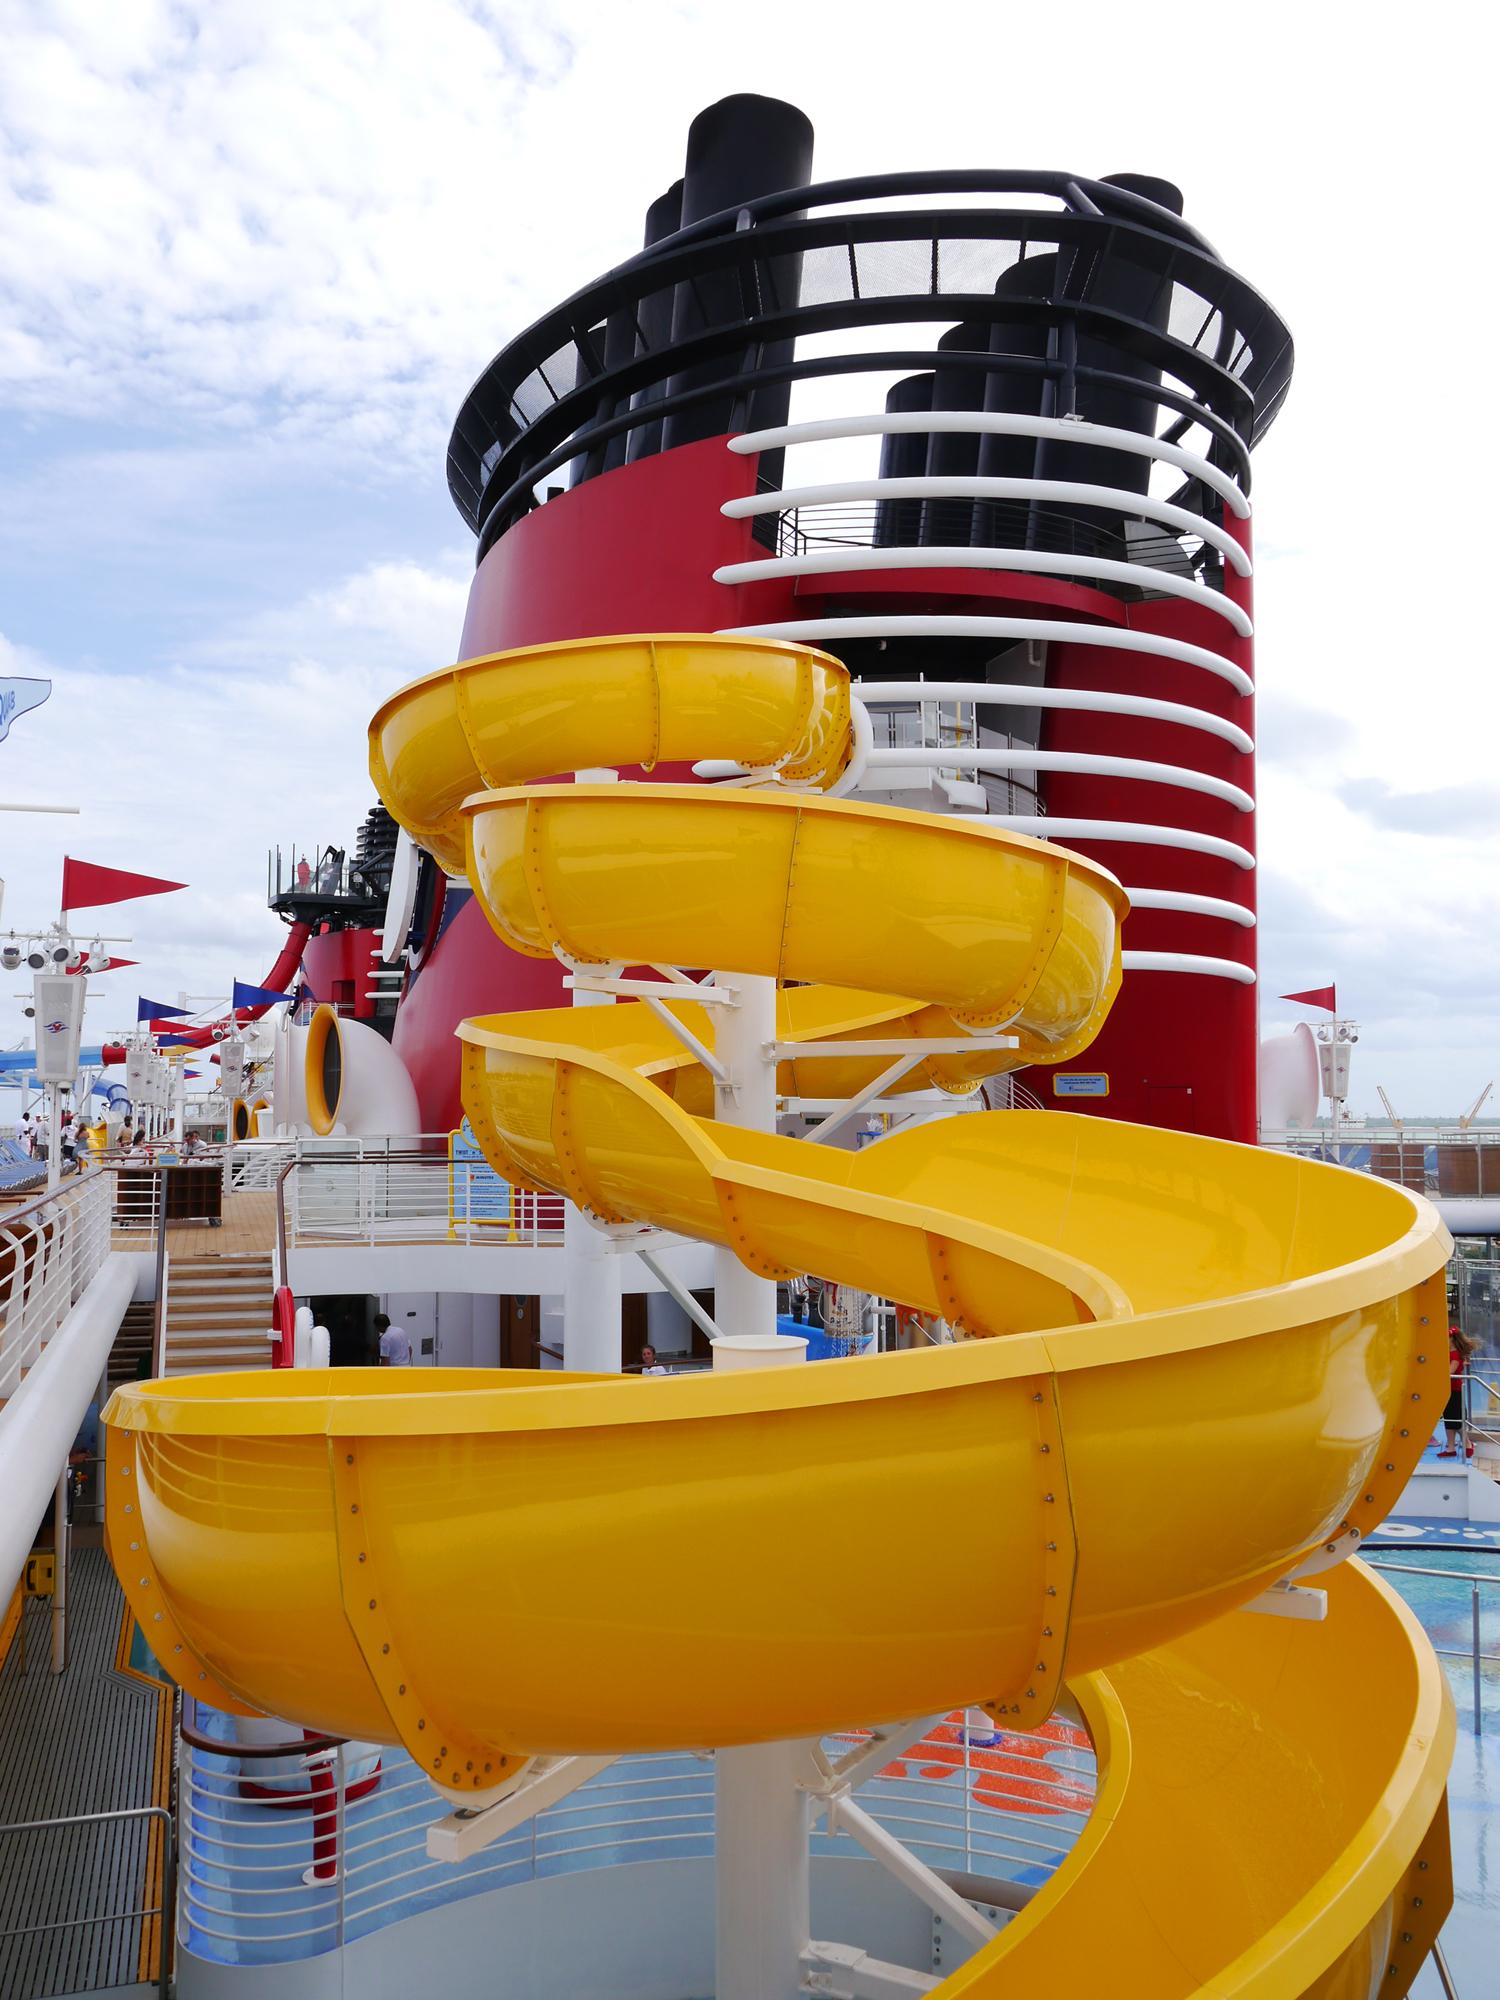 MouseSavers.com - Comparing Disney Cruise Ships